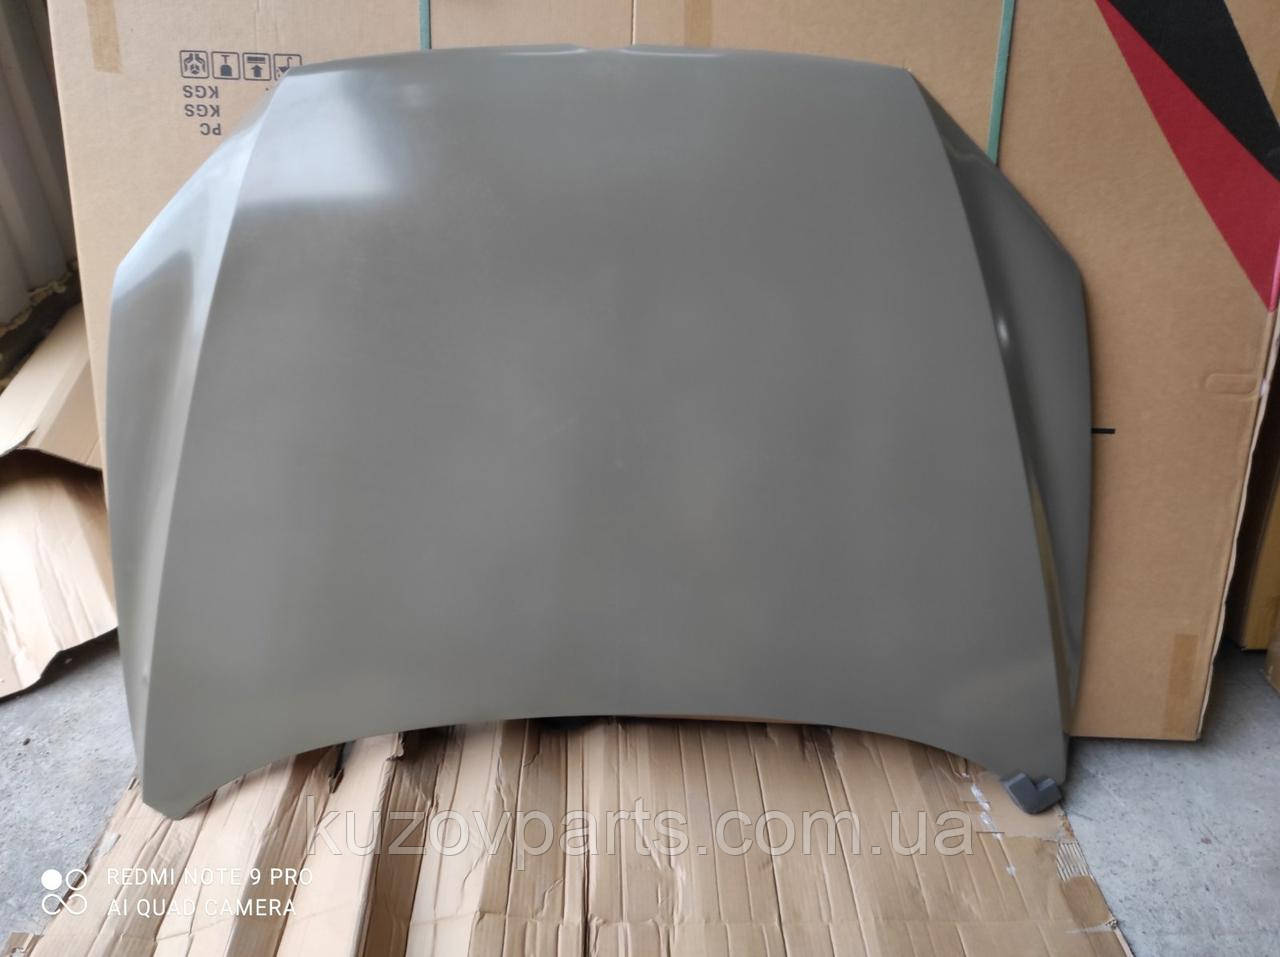 Капот Volkswagen Passat b7 2012 2013 2014 2015 1C0823031L